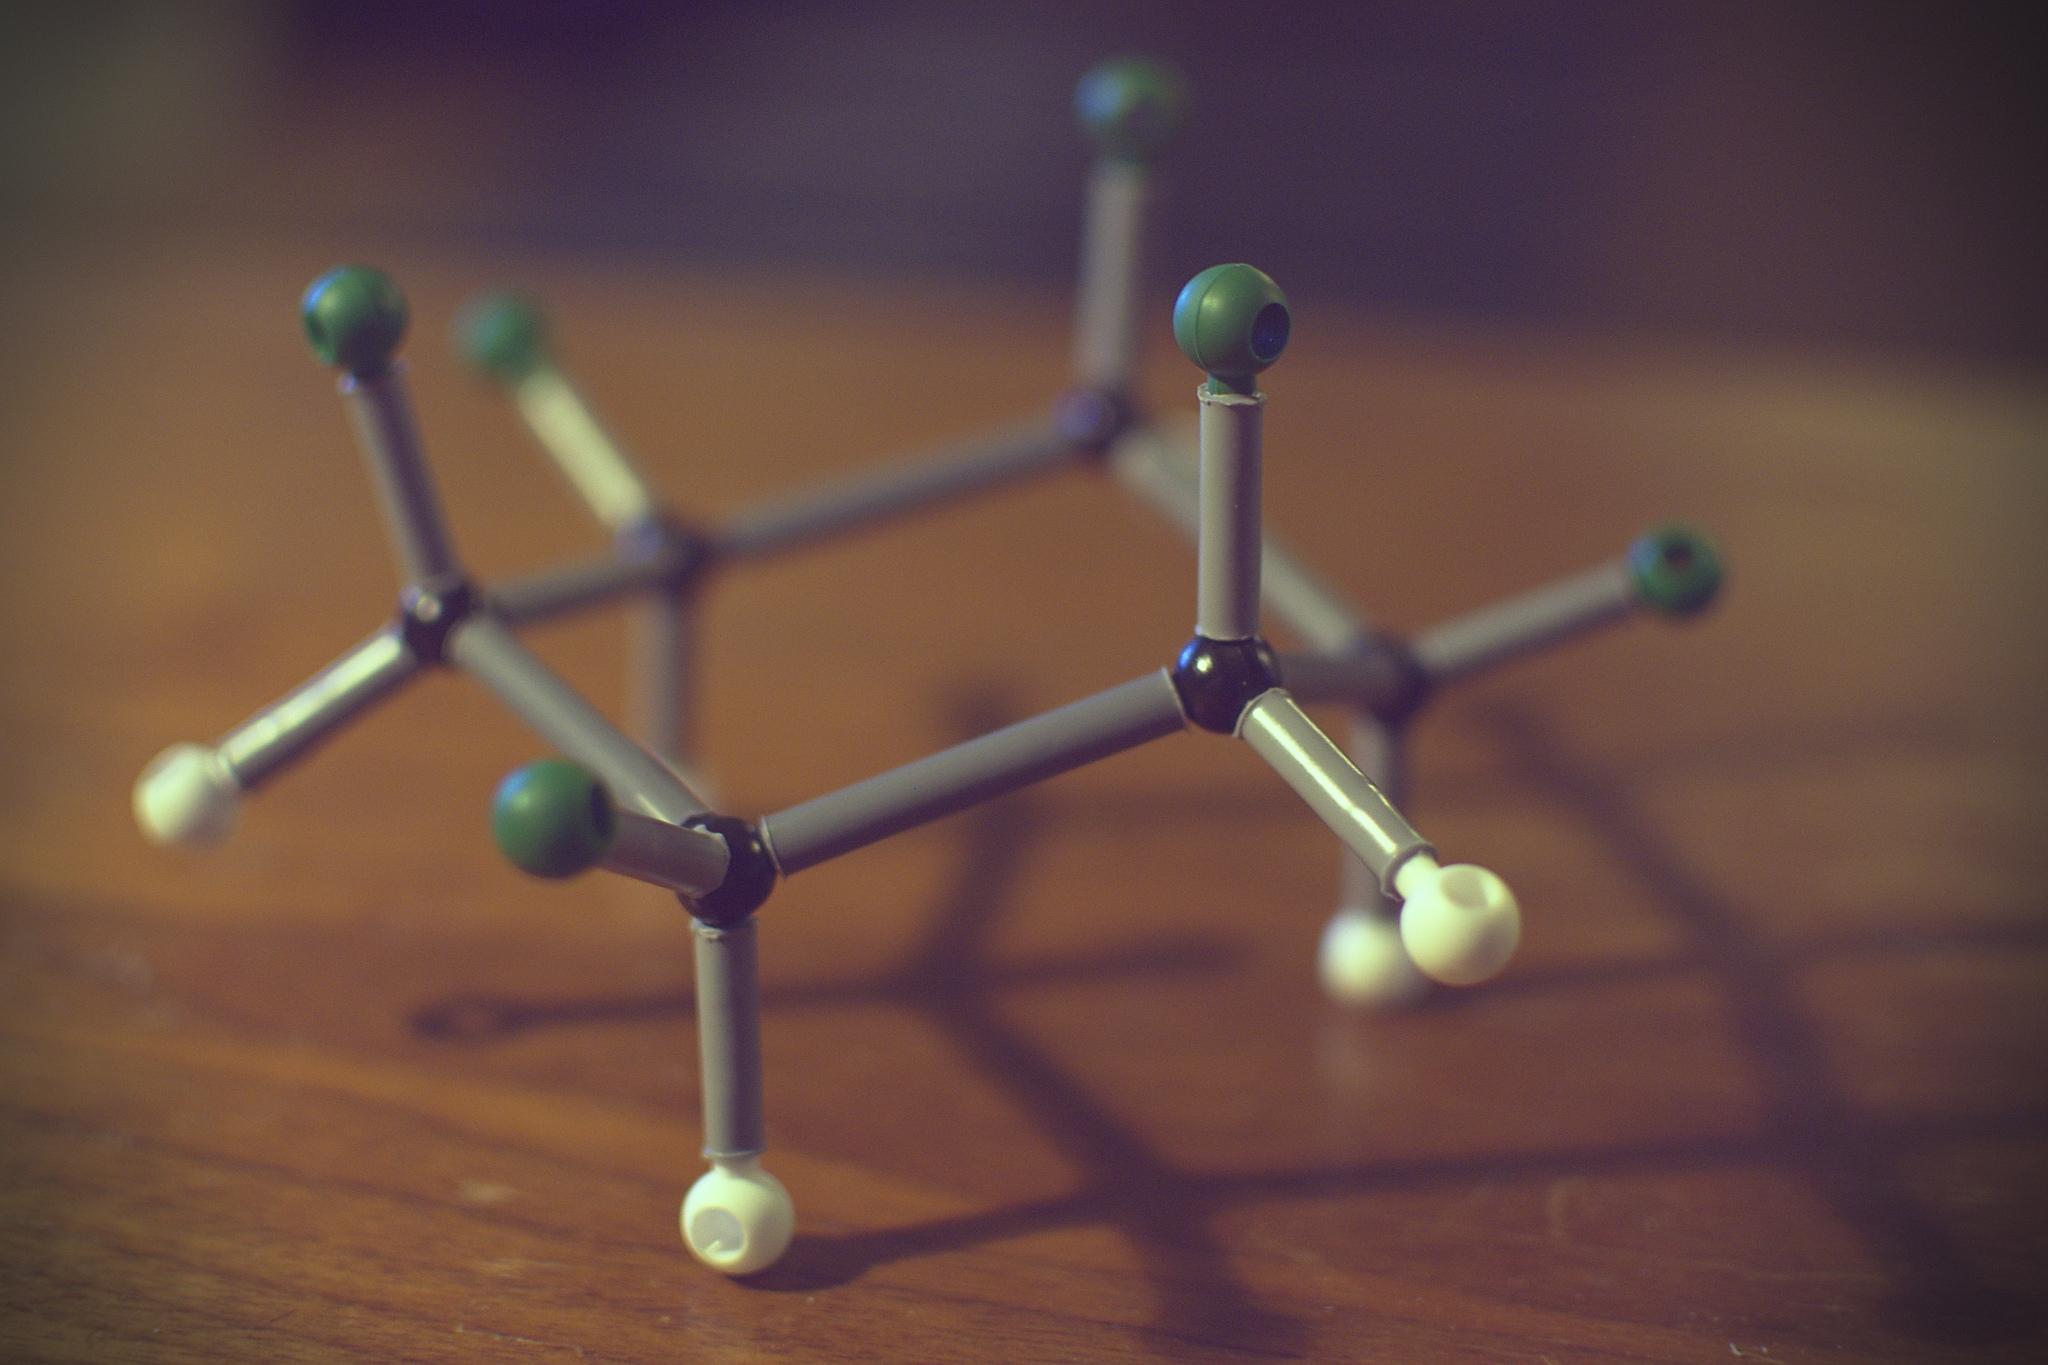 Picture: Cyclohexane by Hanna Sörensson, licence: CC BY-SA 2.0